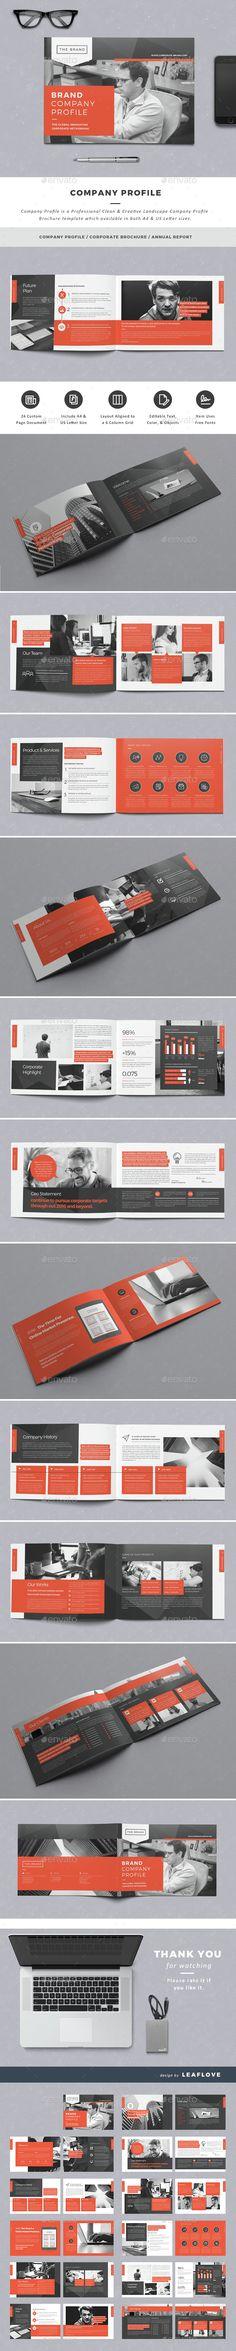 Modern Architecture Brochure Modern architecture, Brochure - architecture brochure template